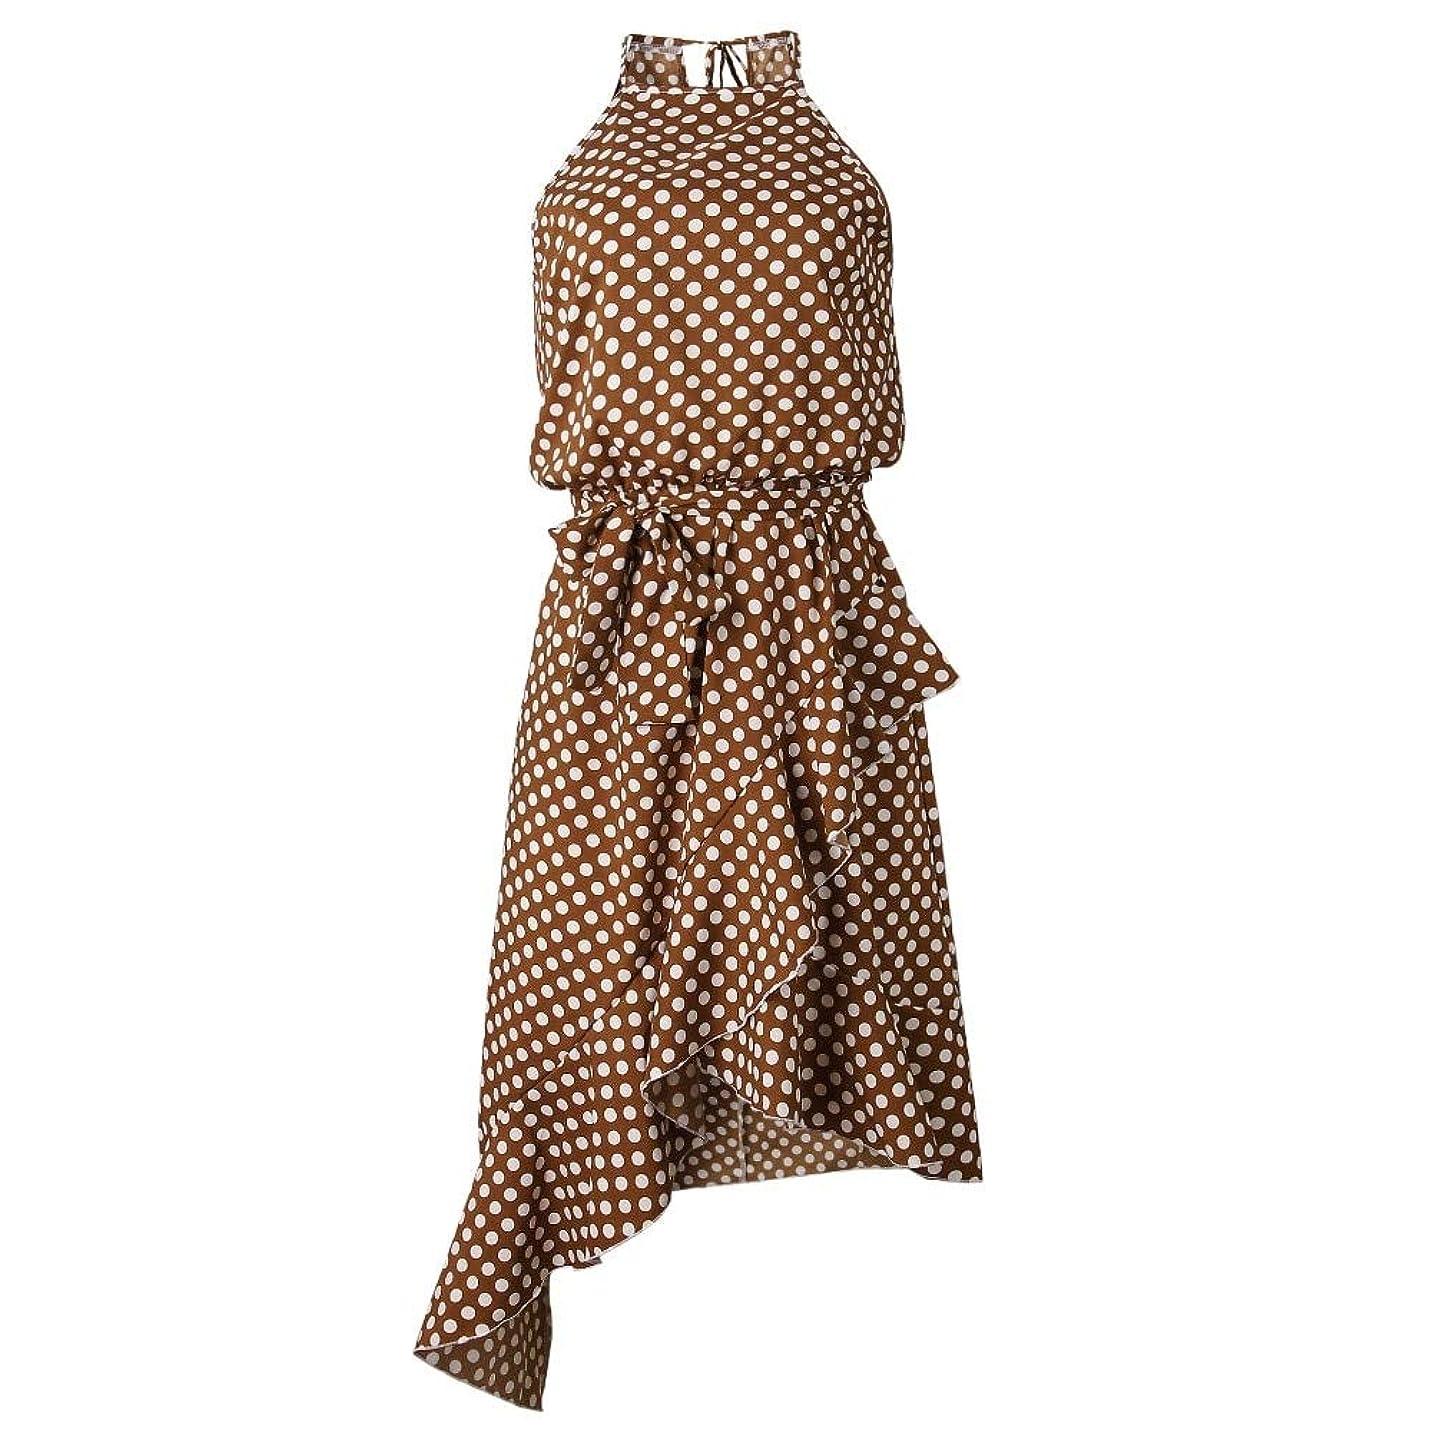 Maxcrestas - 夏のドレスの女性の新しいファッションホルターポルカドットプリントカジュアルドレスレディースフリルエレガントなドレス